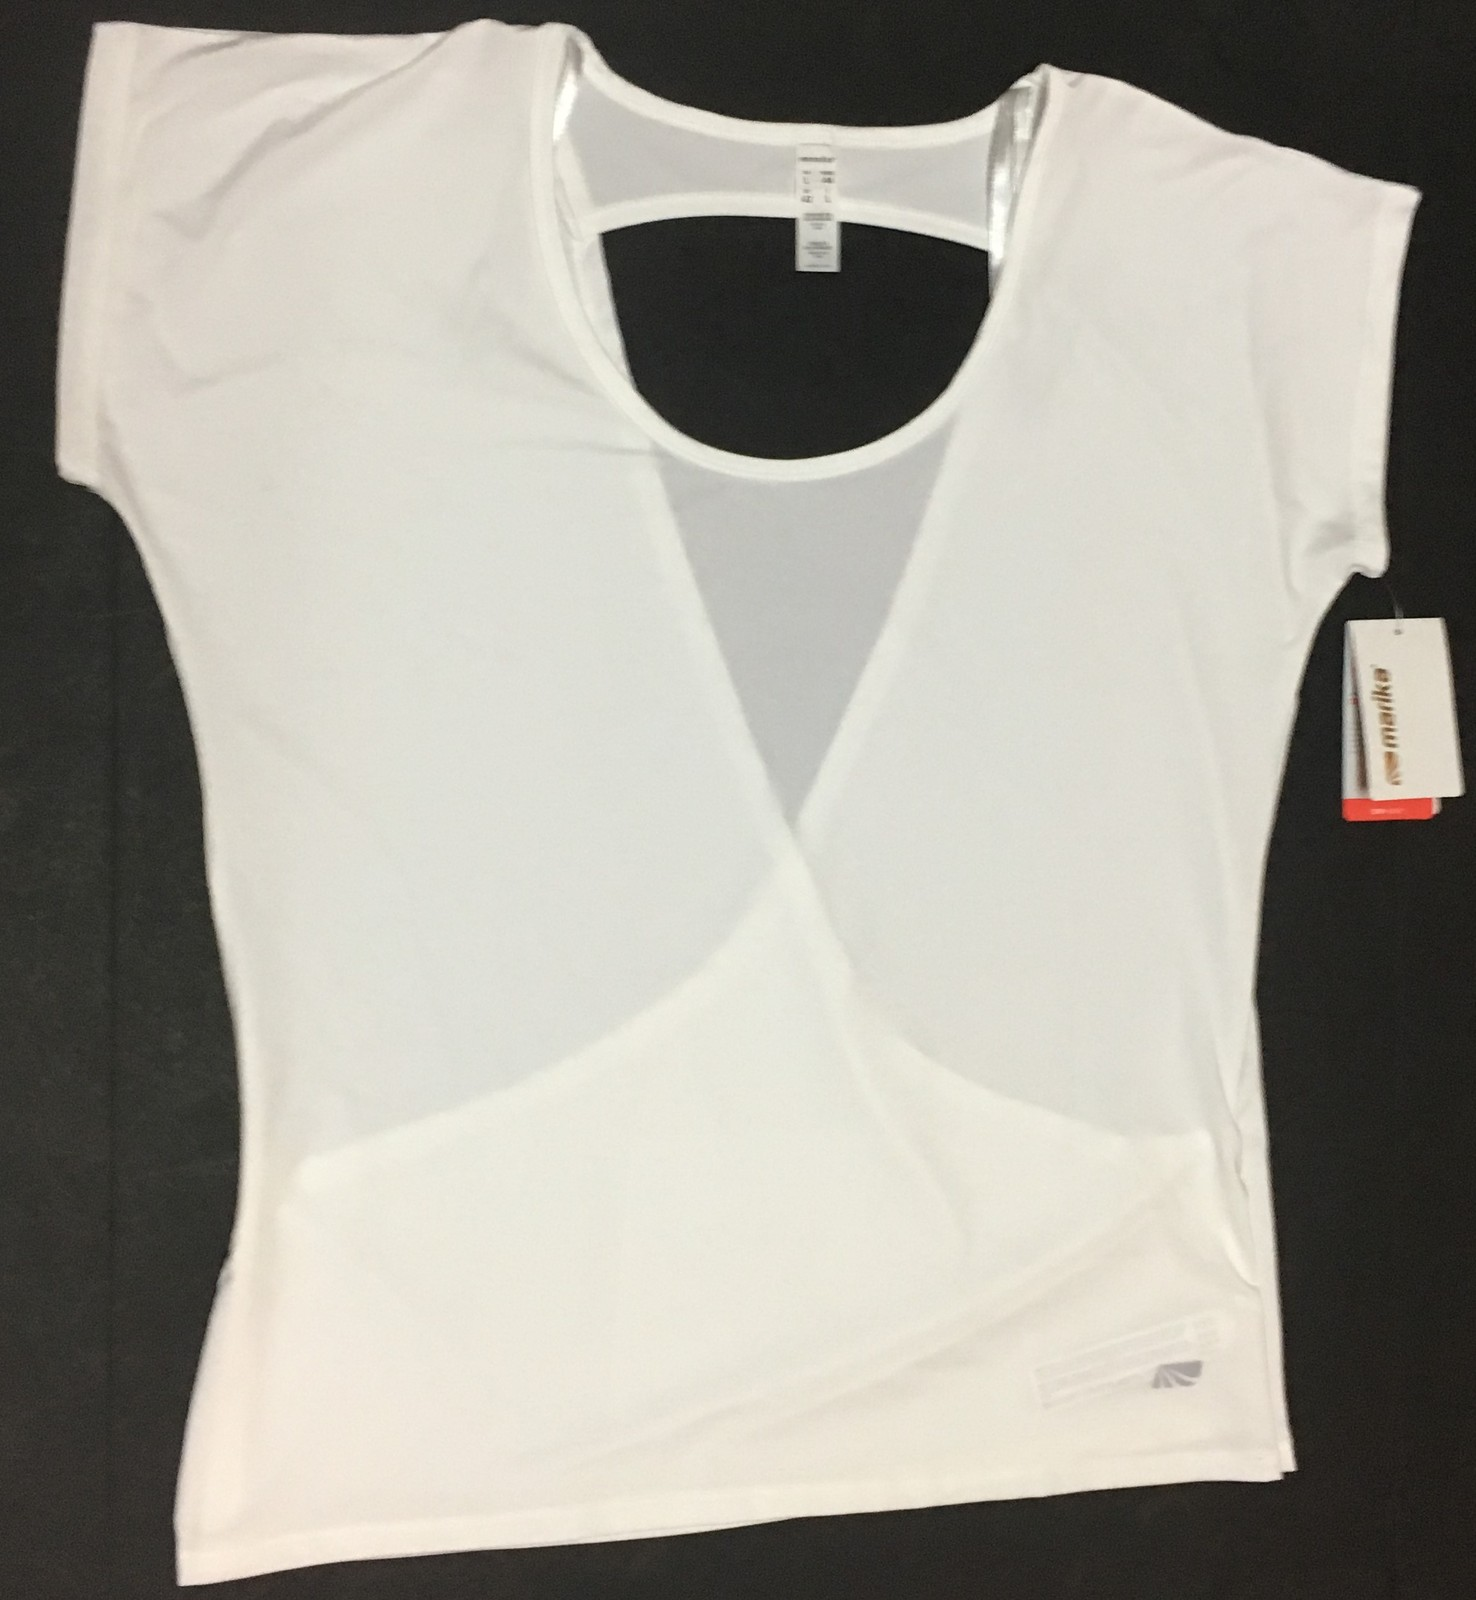 Marika Performance Dry Wik Top Blouse White Open Cross Over Back Sz L NWT